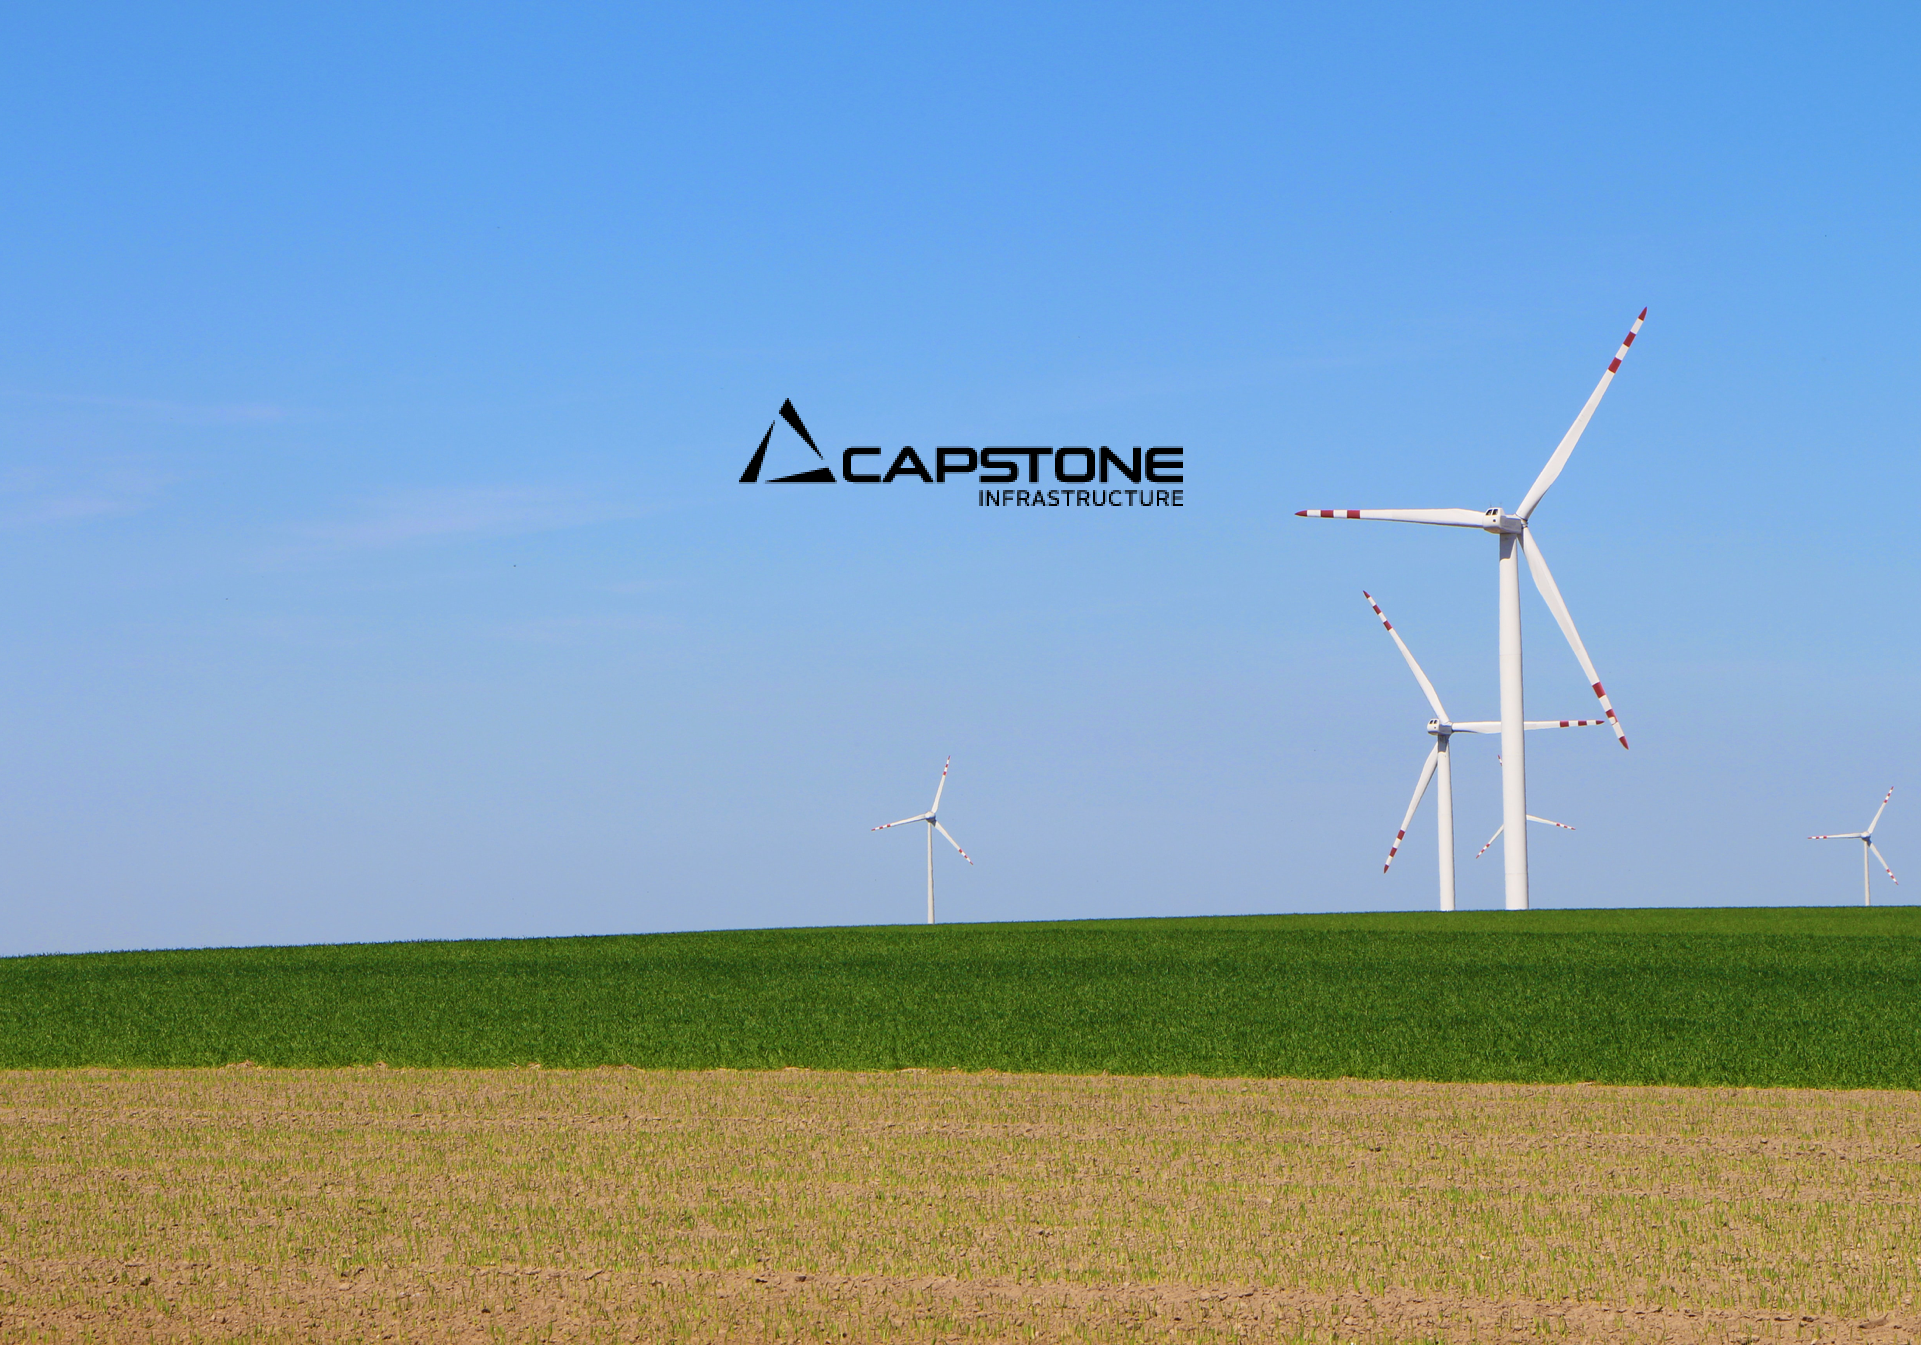 Capstone - HDD